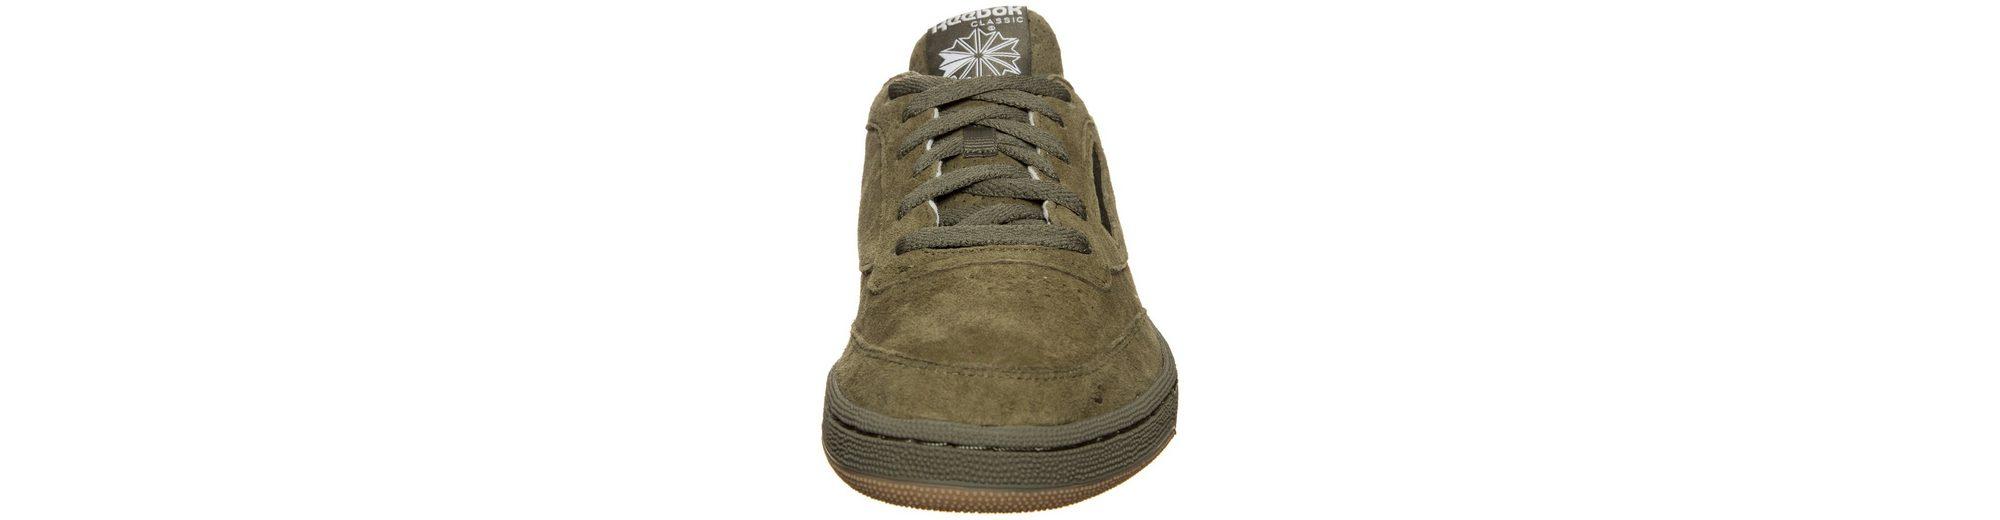 Low-Cost Verkauf Online Reebok Classic Club C 85 Sg Sneaker Spielraum Billig Echt Billig Neueste l57tmV9